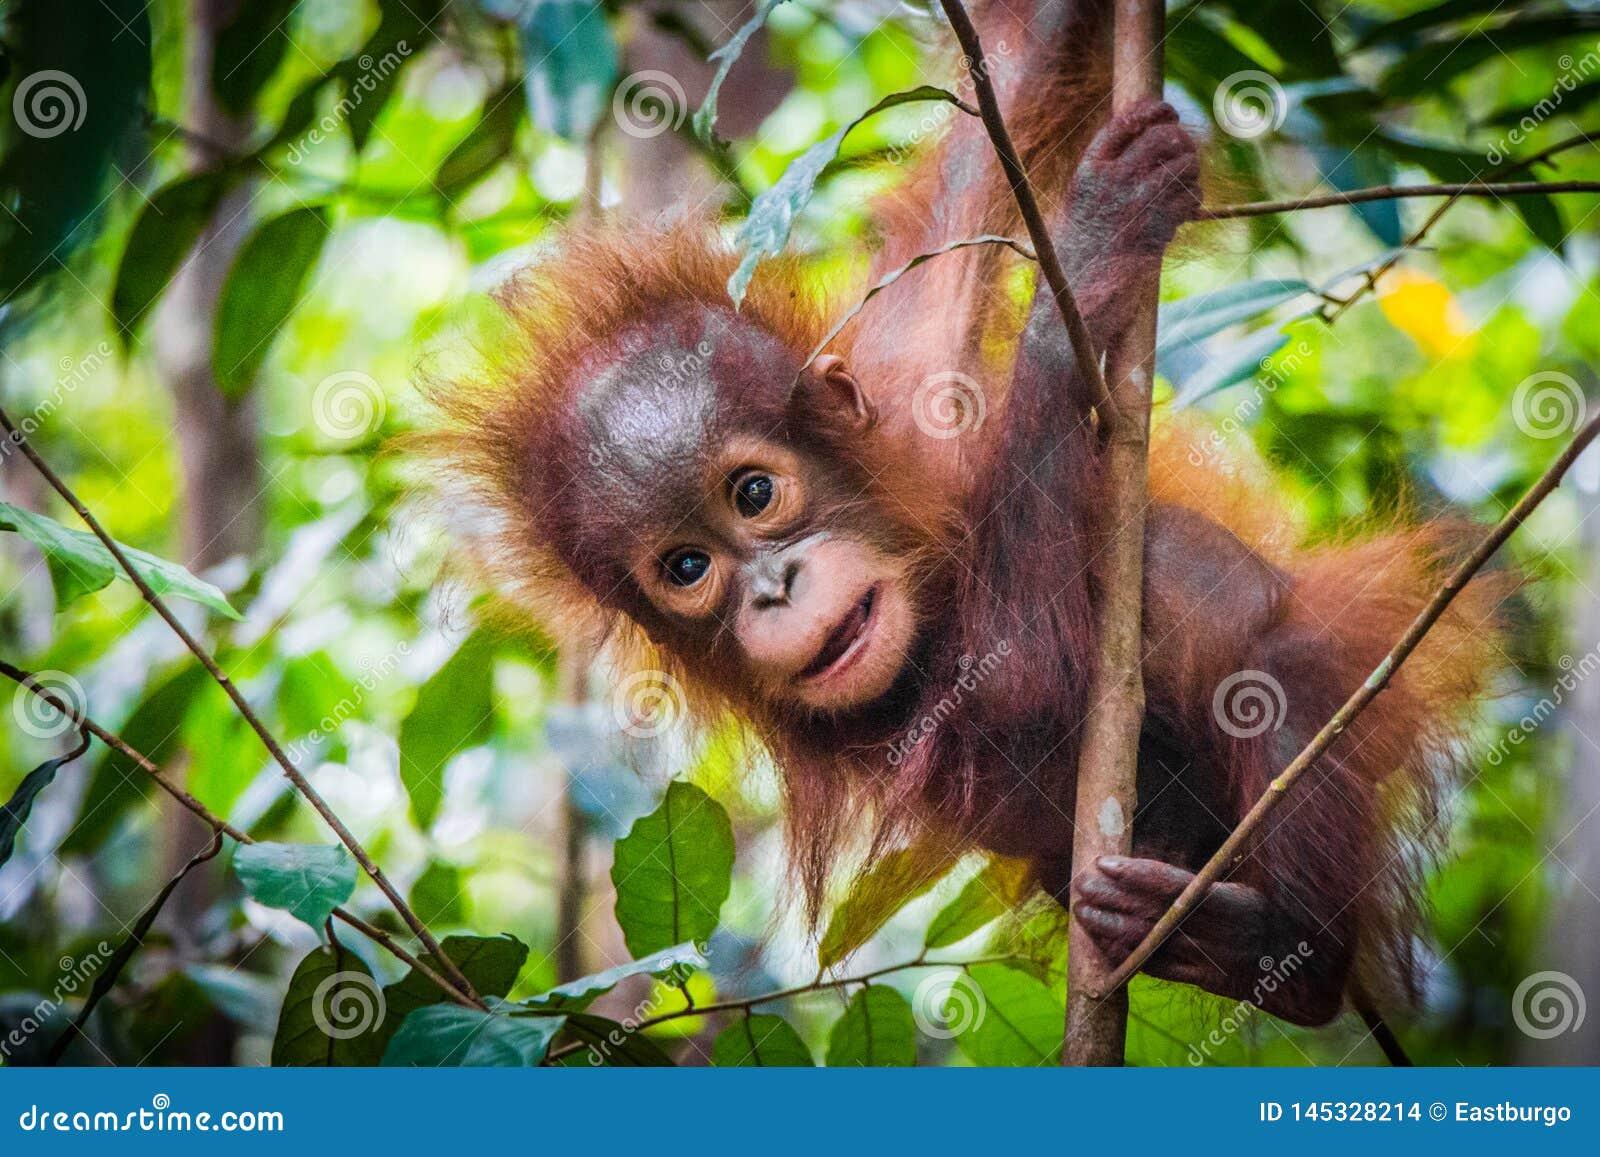 World`s cutest baby orangutan hangs in a tree in Borneo